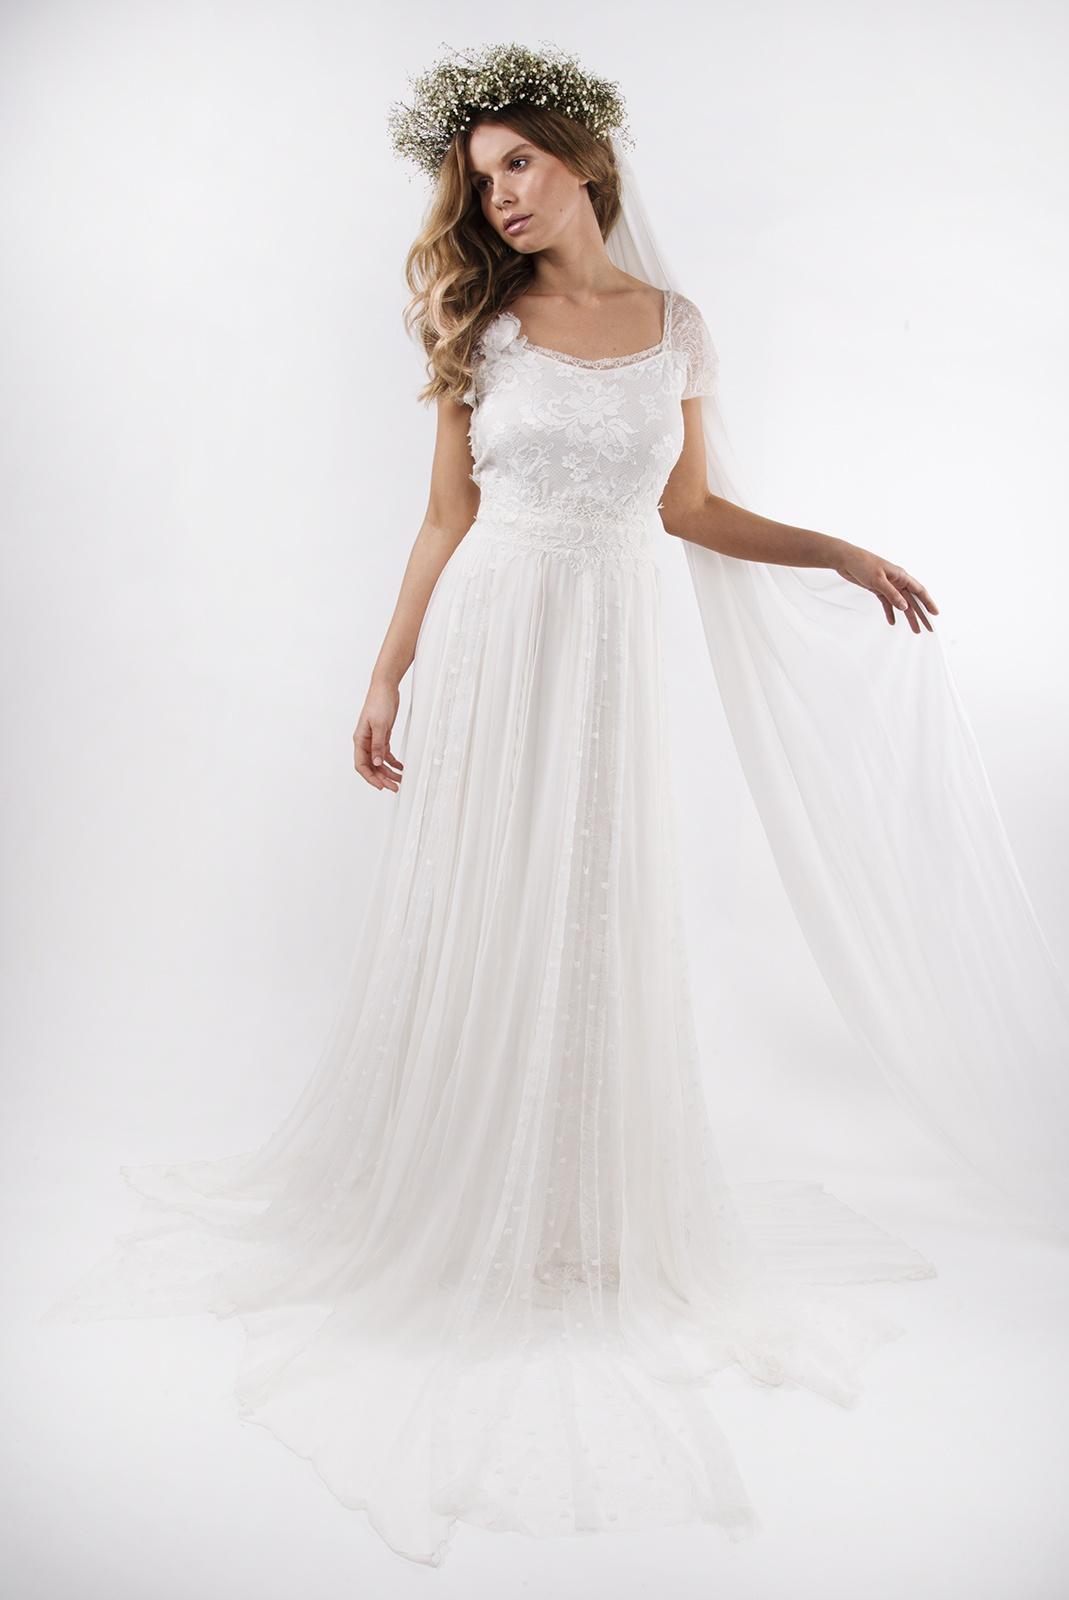 J Crew Wedding Dress.J Crew Wedding Dresses On Real Brides Dacc